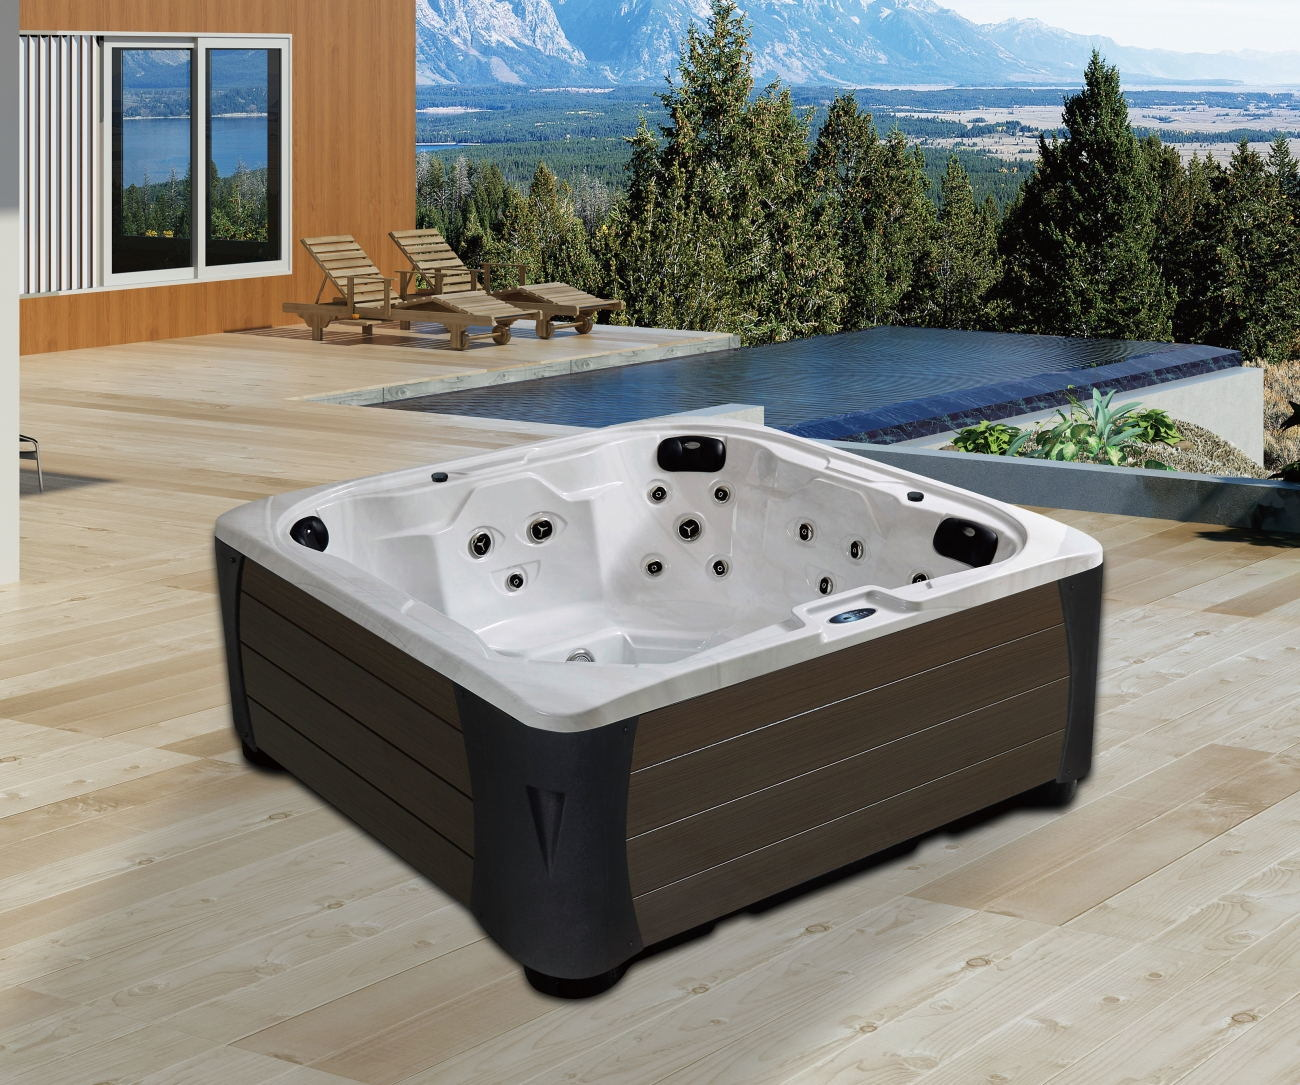 China Freestanding Square Shape Hydro Massage SPA Whirlpool Outdoor ...